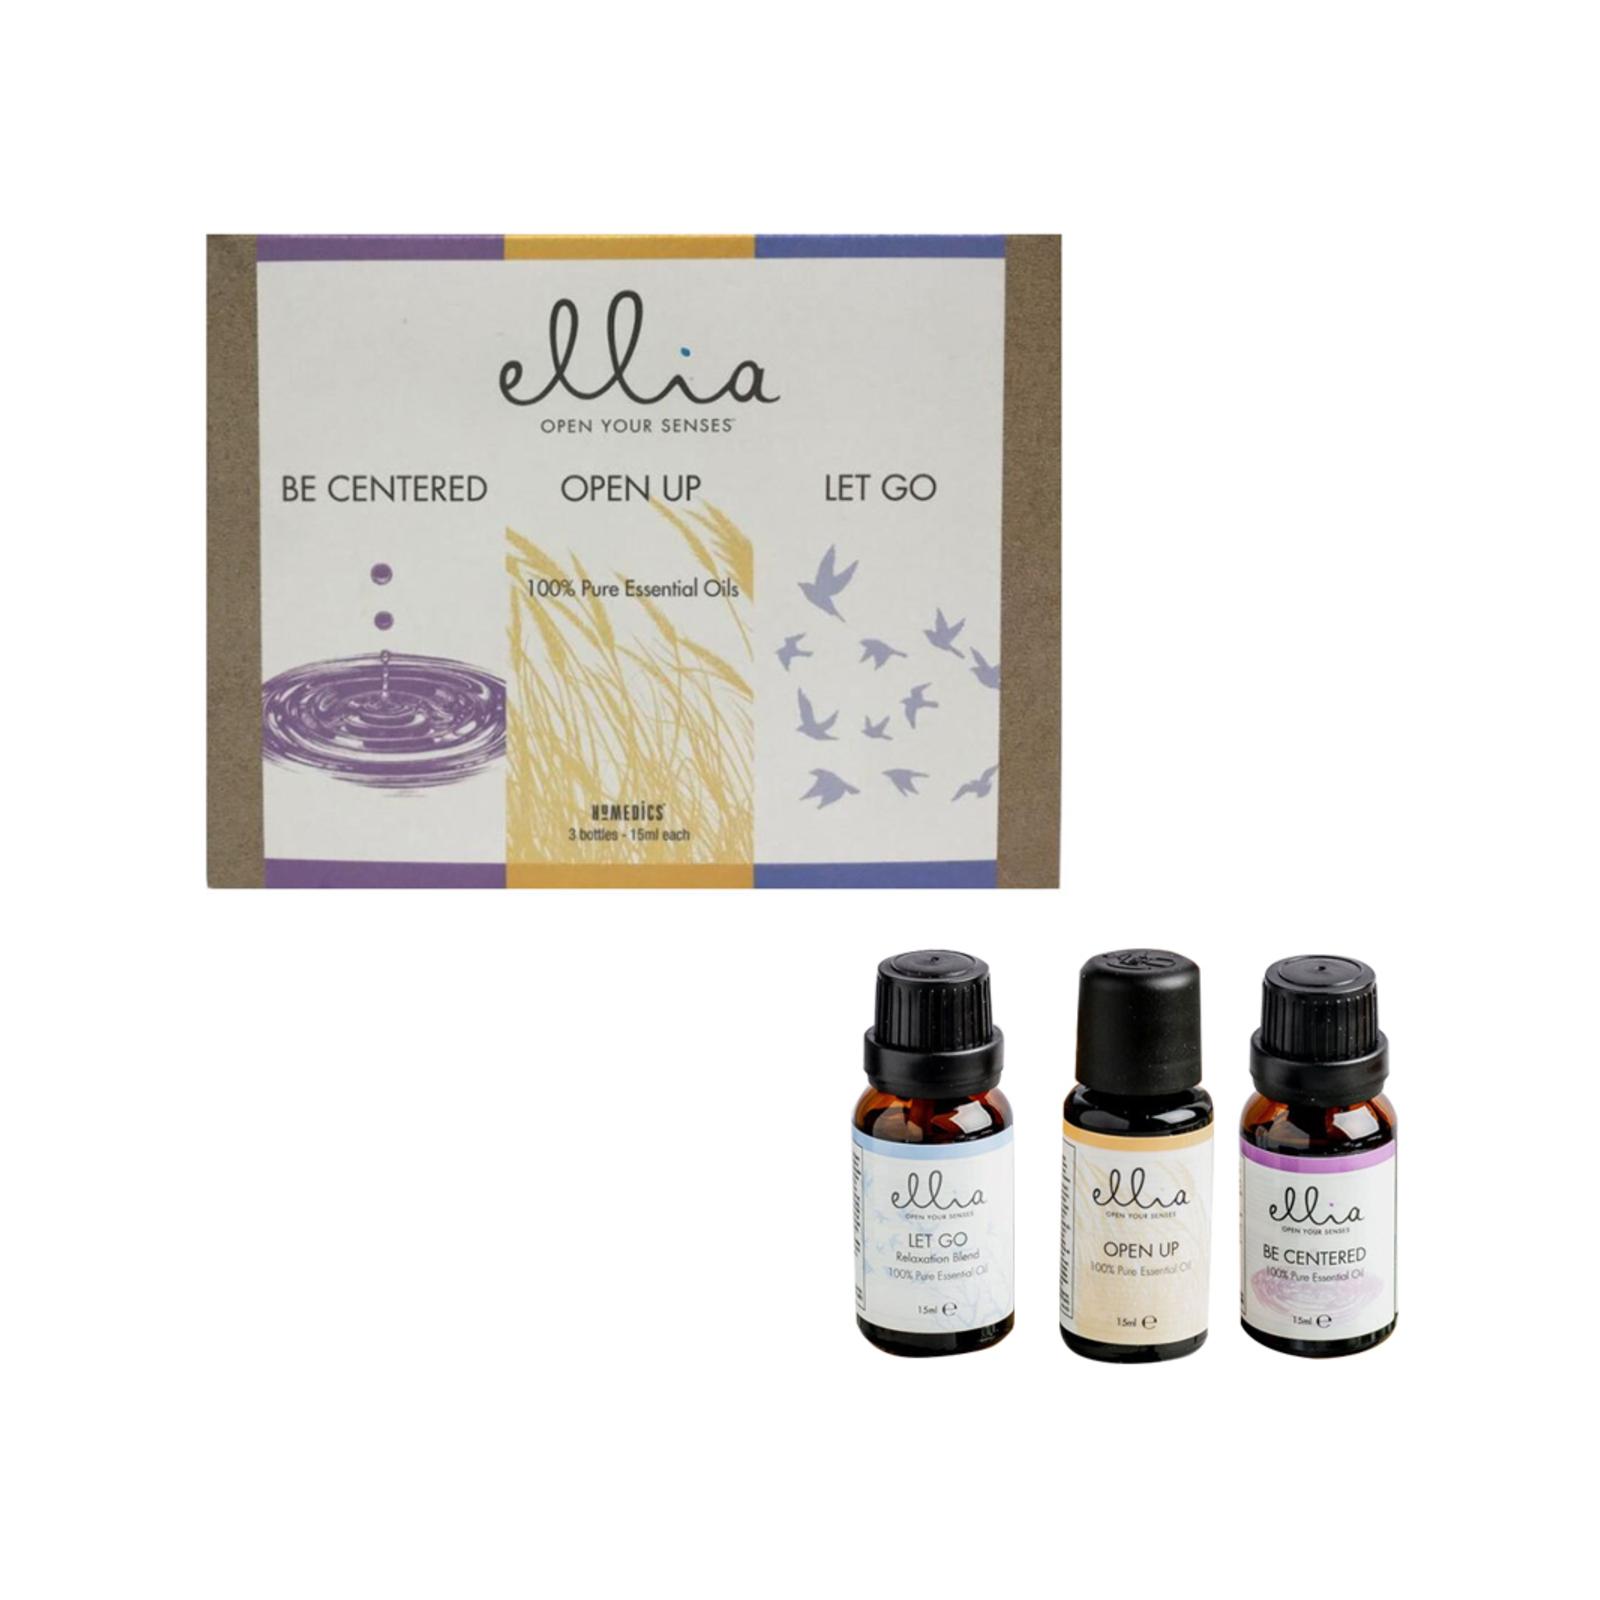 3pc Homedics Ellia 15ml Essential Oil Pack Relaxation/Invigoration/Aromatherapy